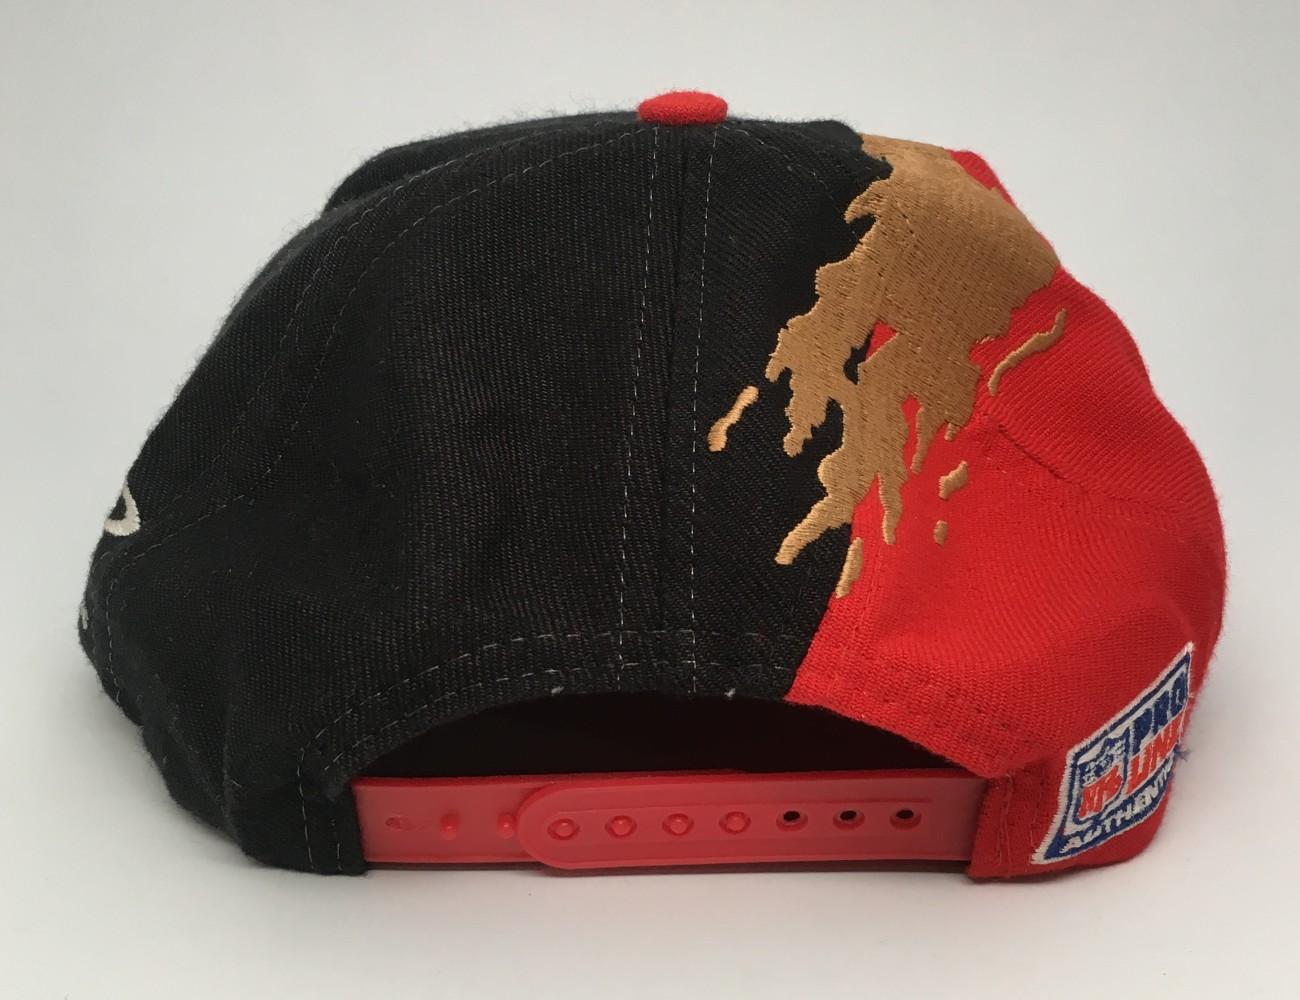 90 s San Francisco 49ers paint splash logo athletic NFL snapback hat 7225f6a5f